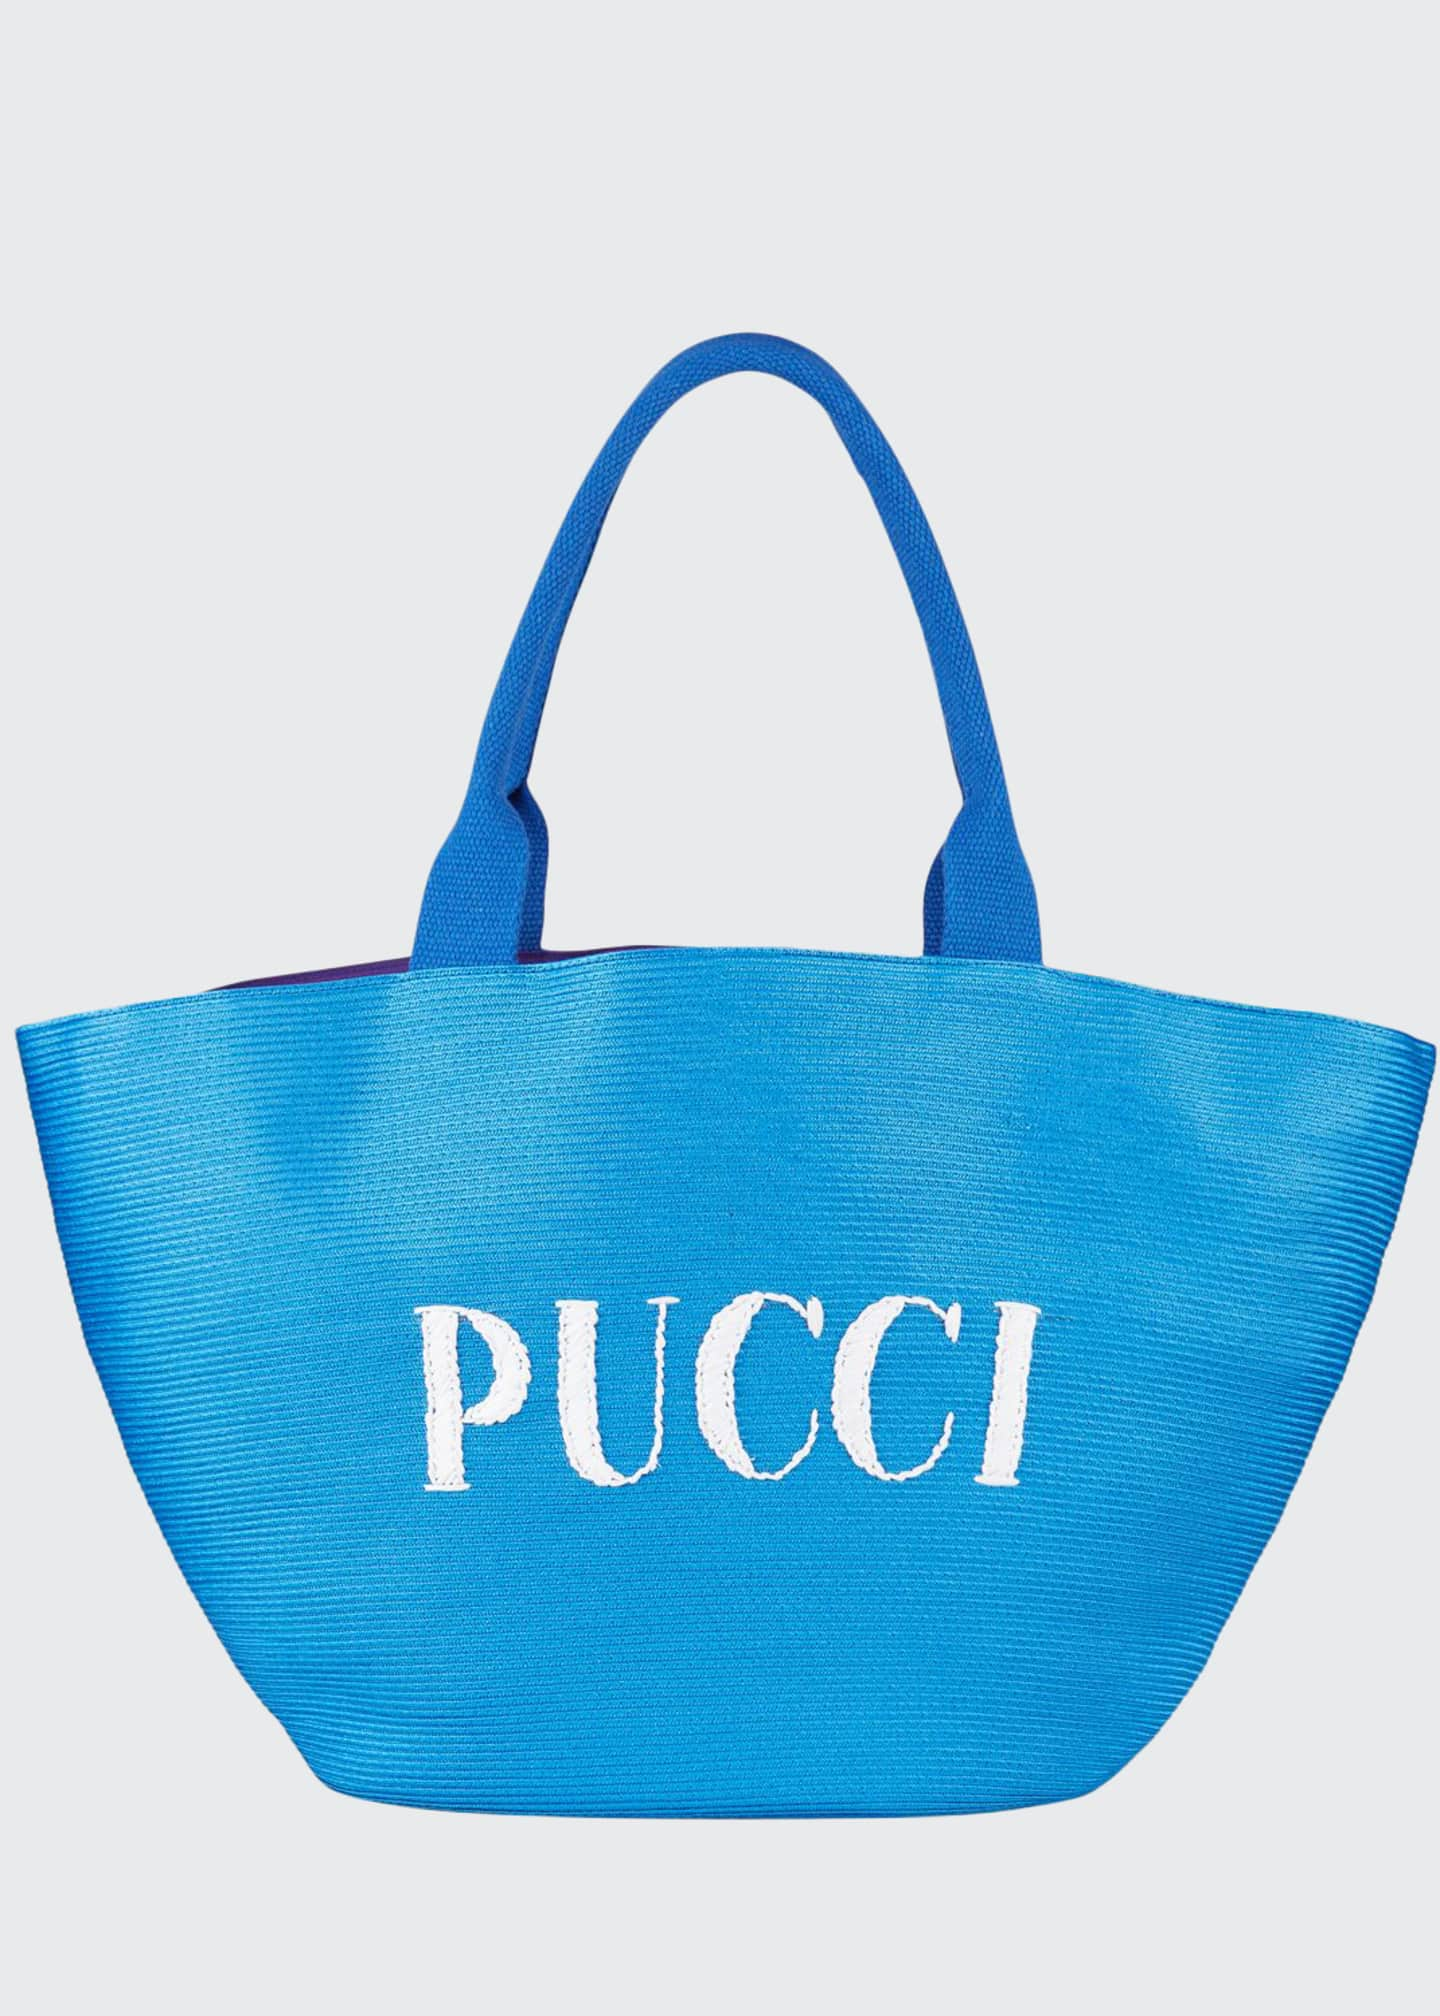 Emilio Pucci Straw Beach Tote Bag